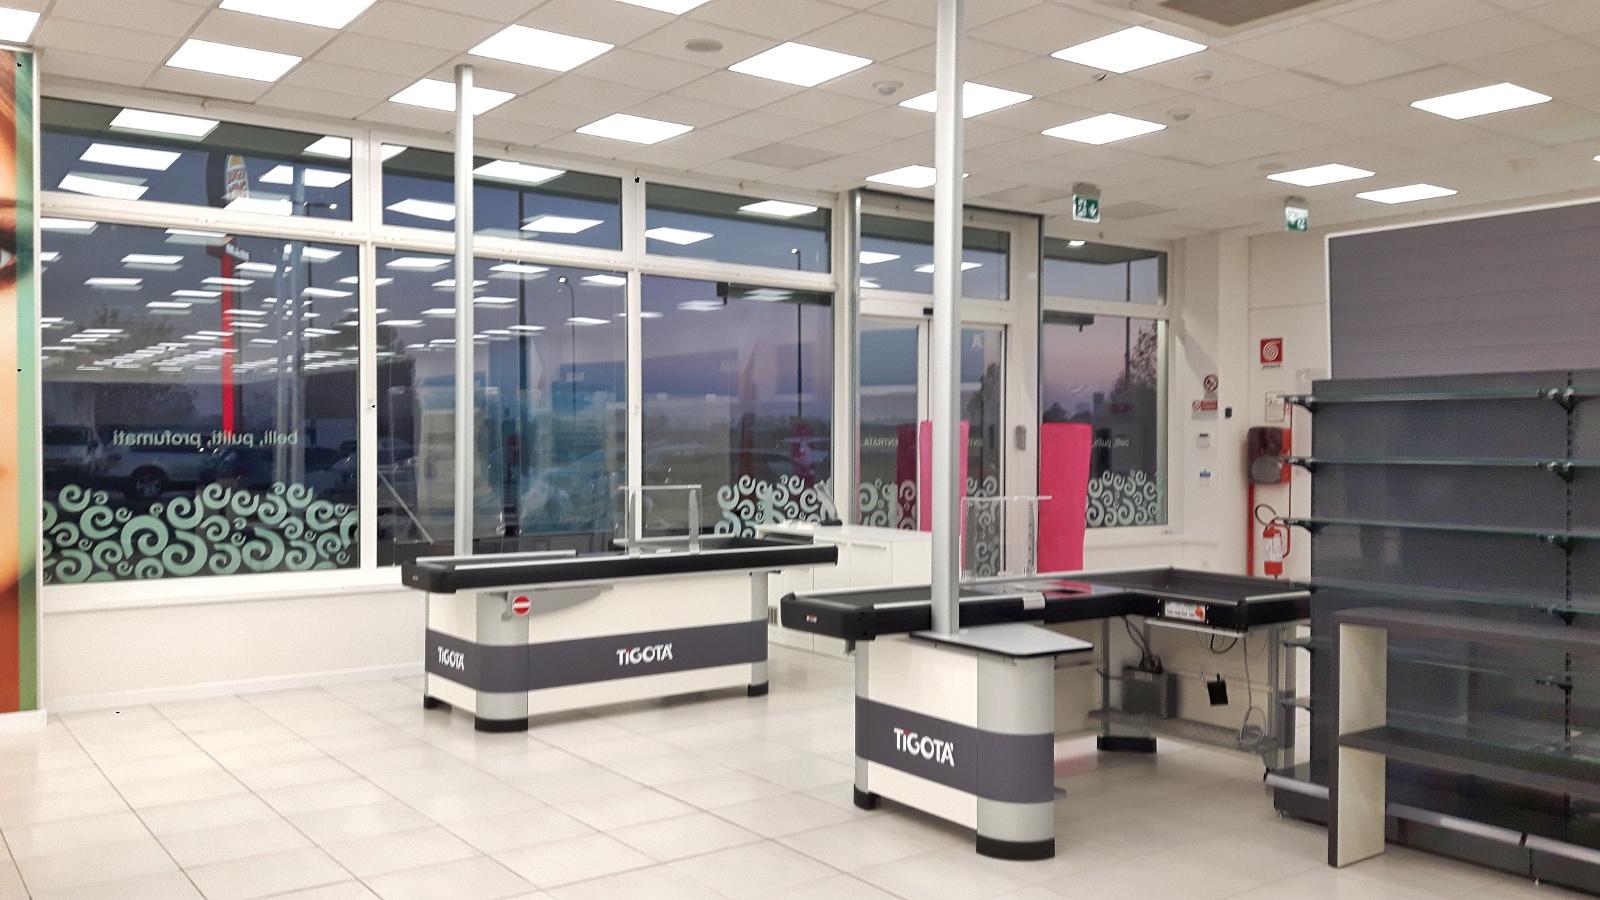 Servizi di pulizie personalizzati per negozi, uffici, showroom